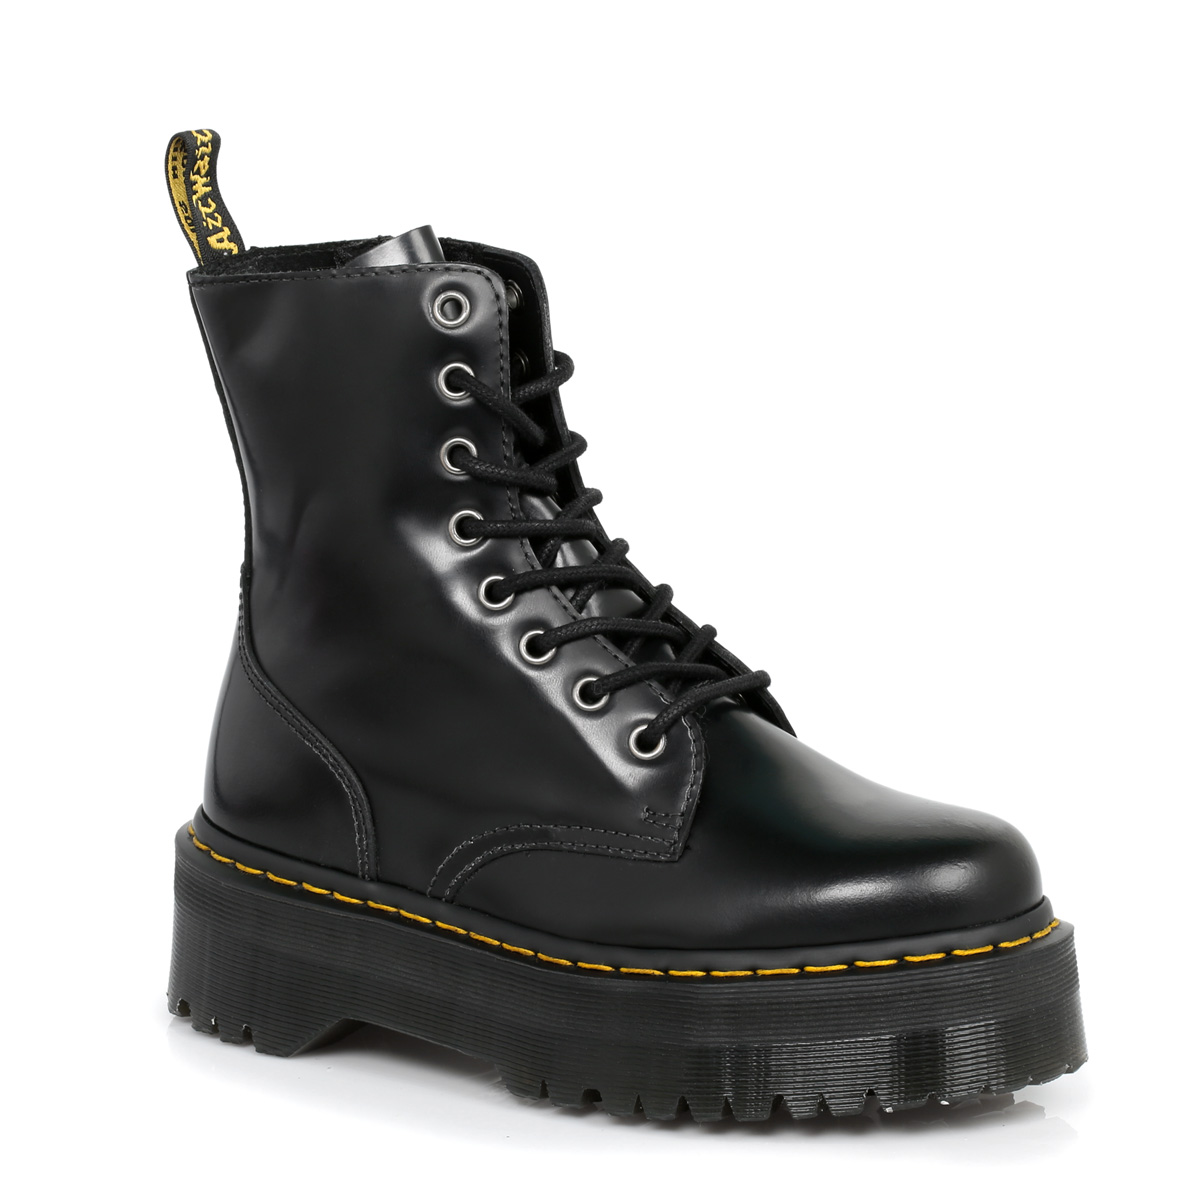 Dr Martens Black Jadon Leather Womens Boots sizes 3-9